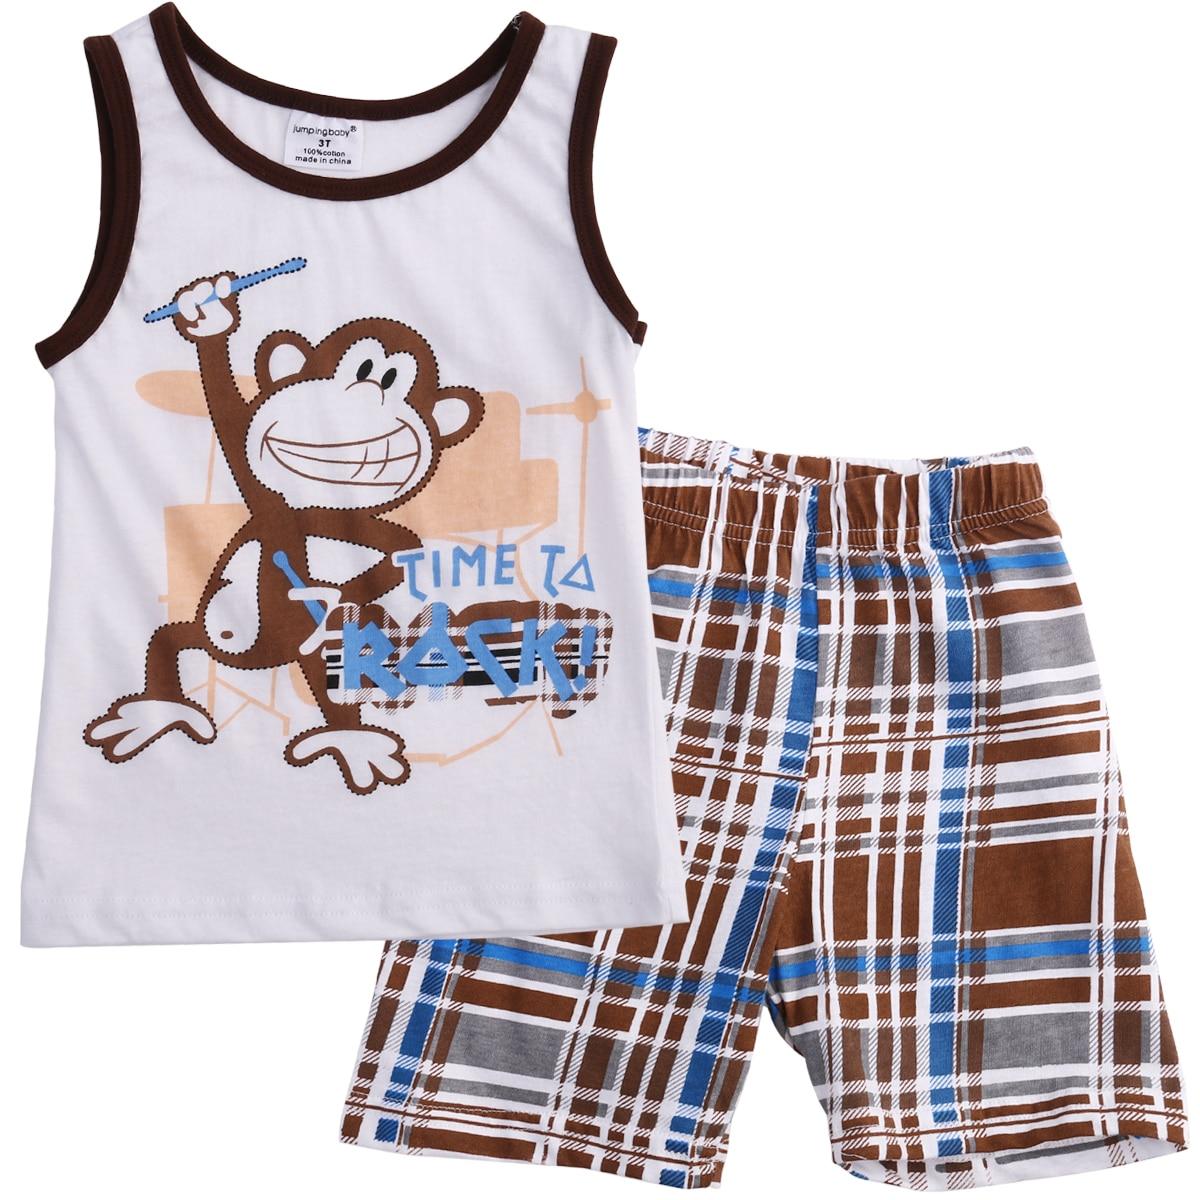 Toddler Kids Baby Boys Summer Outfits Monkey Sleeveless T-shirt Tank Tops+short Plaid Short Pants 2pcs Clothes Set Clothing Sets